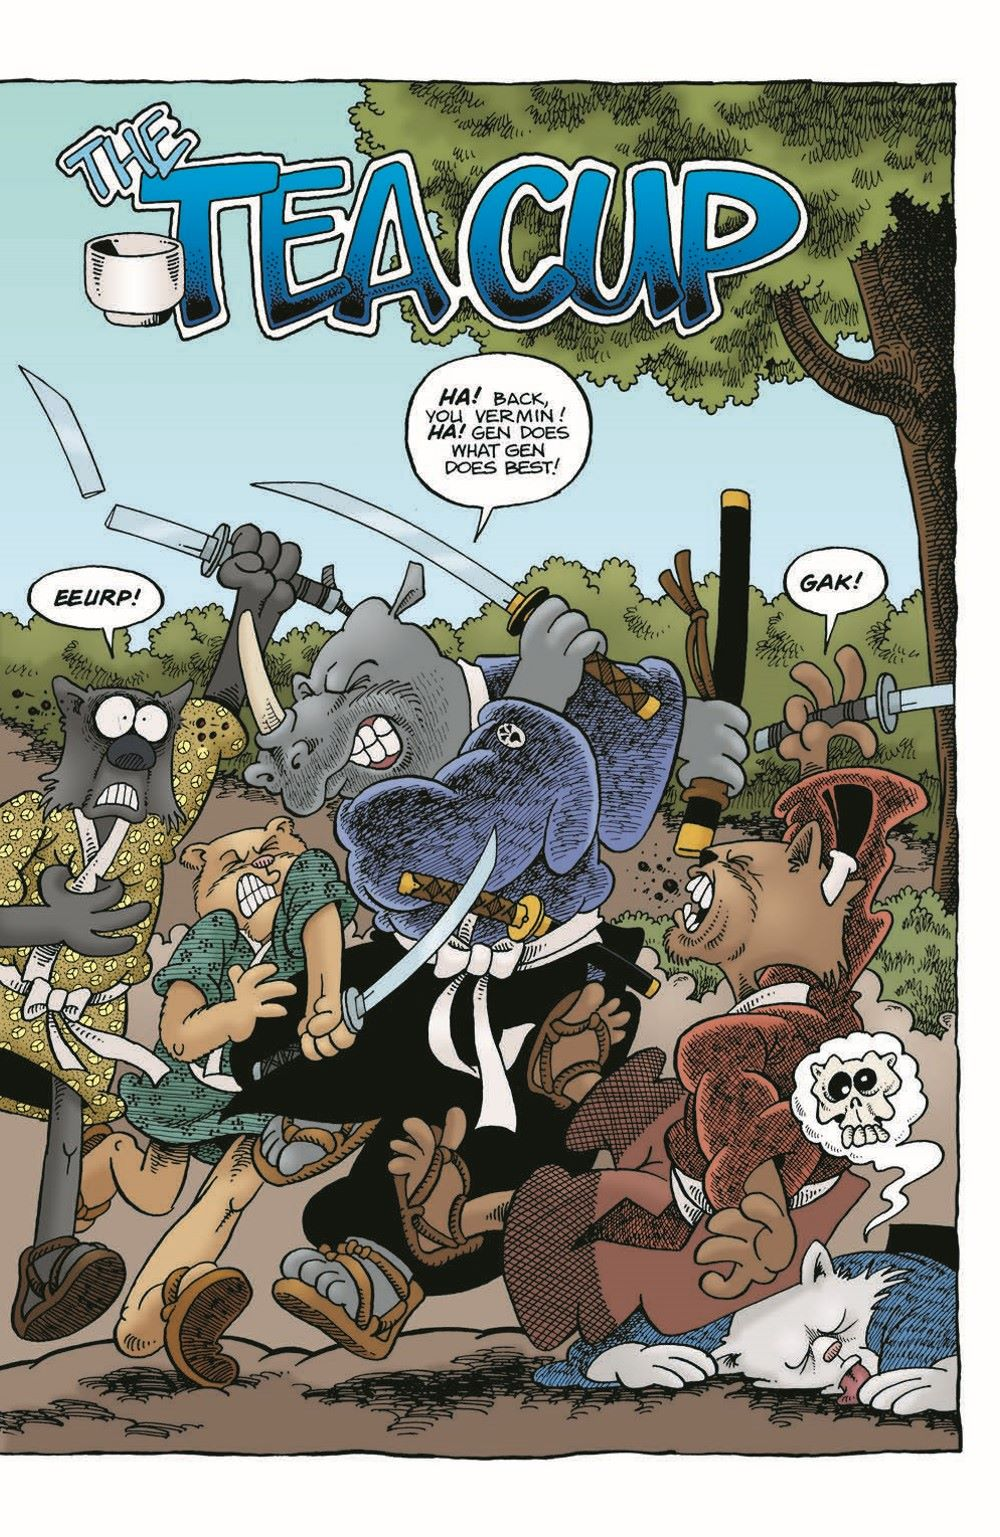 Usagi-WR05_pr-5 ComicList Previews: USAGI YOJIMBO WANDERER'S ROAD #5 (OF 6)